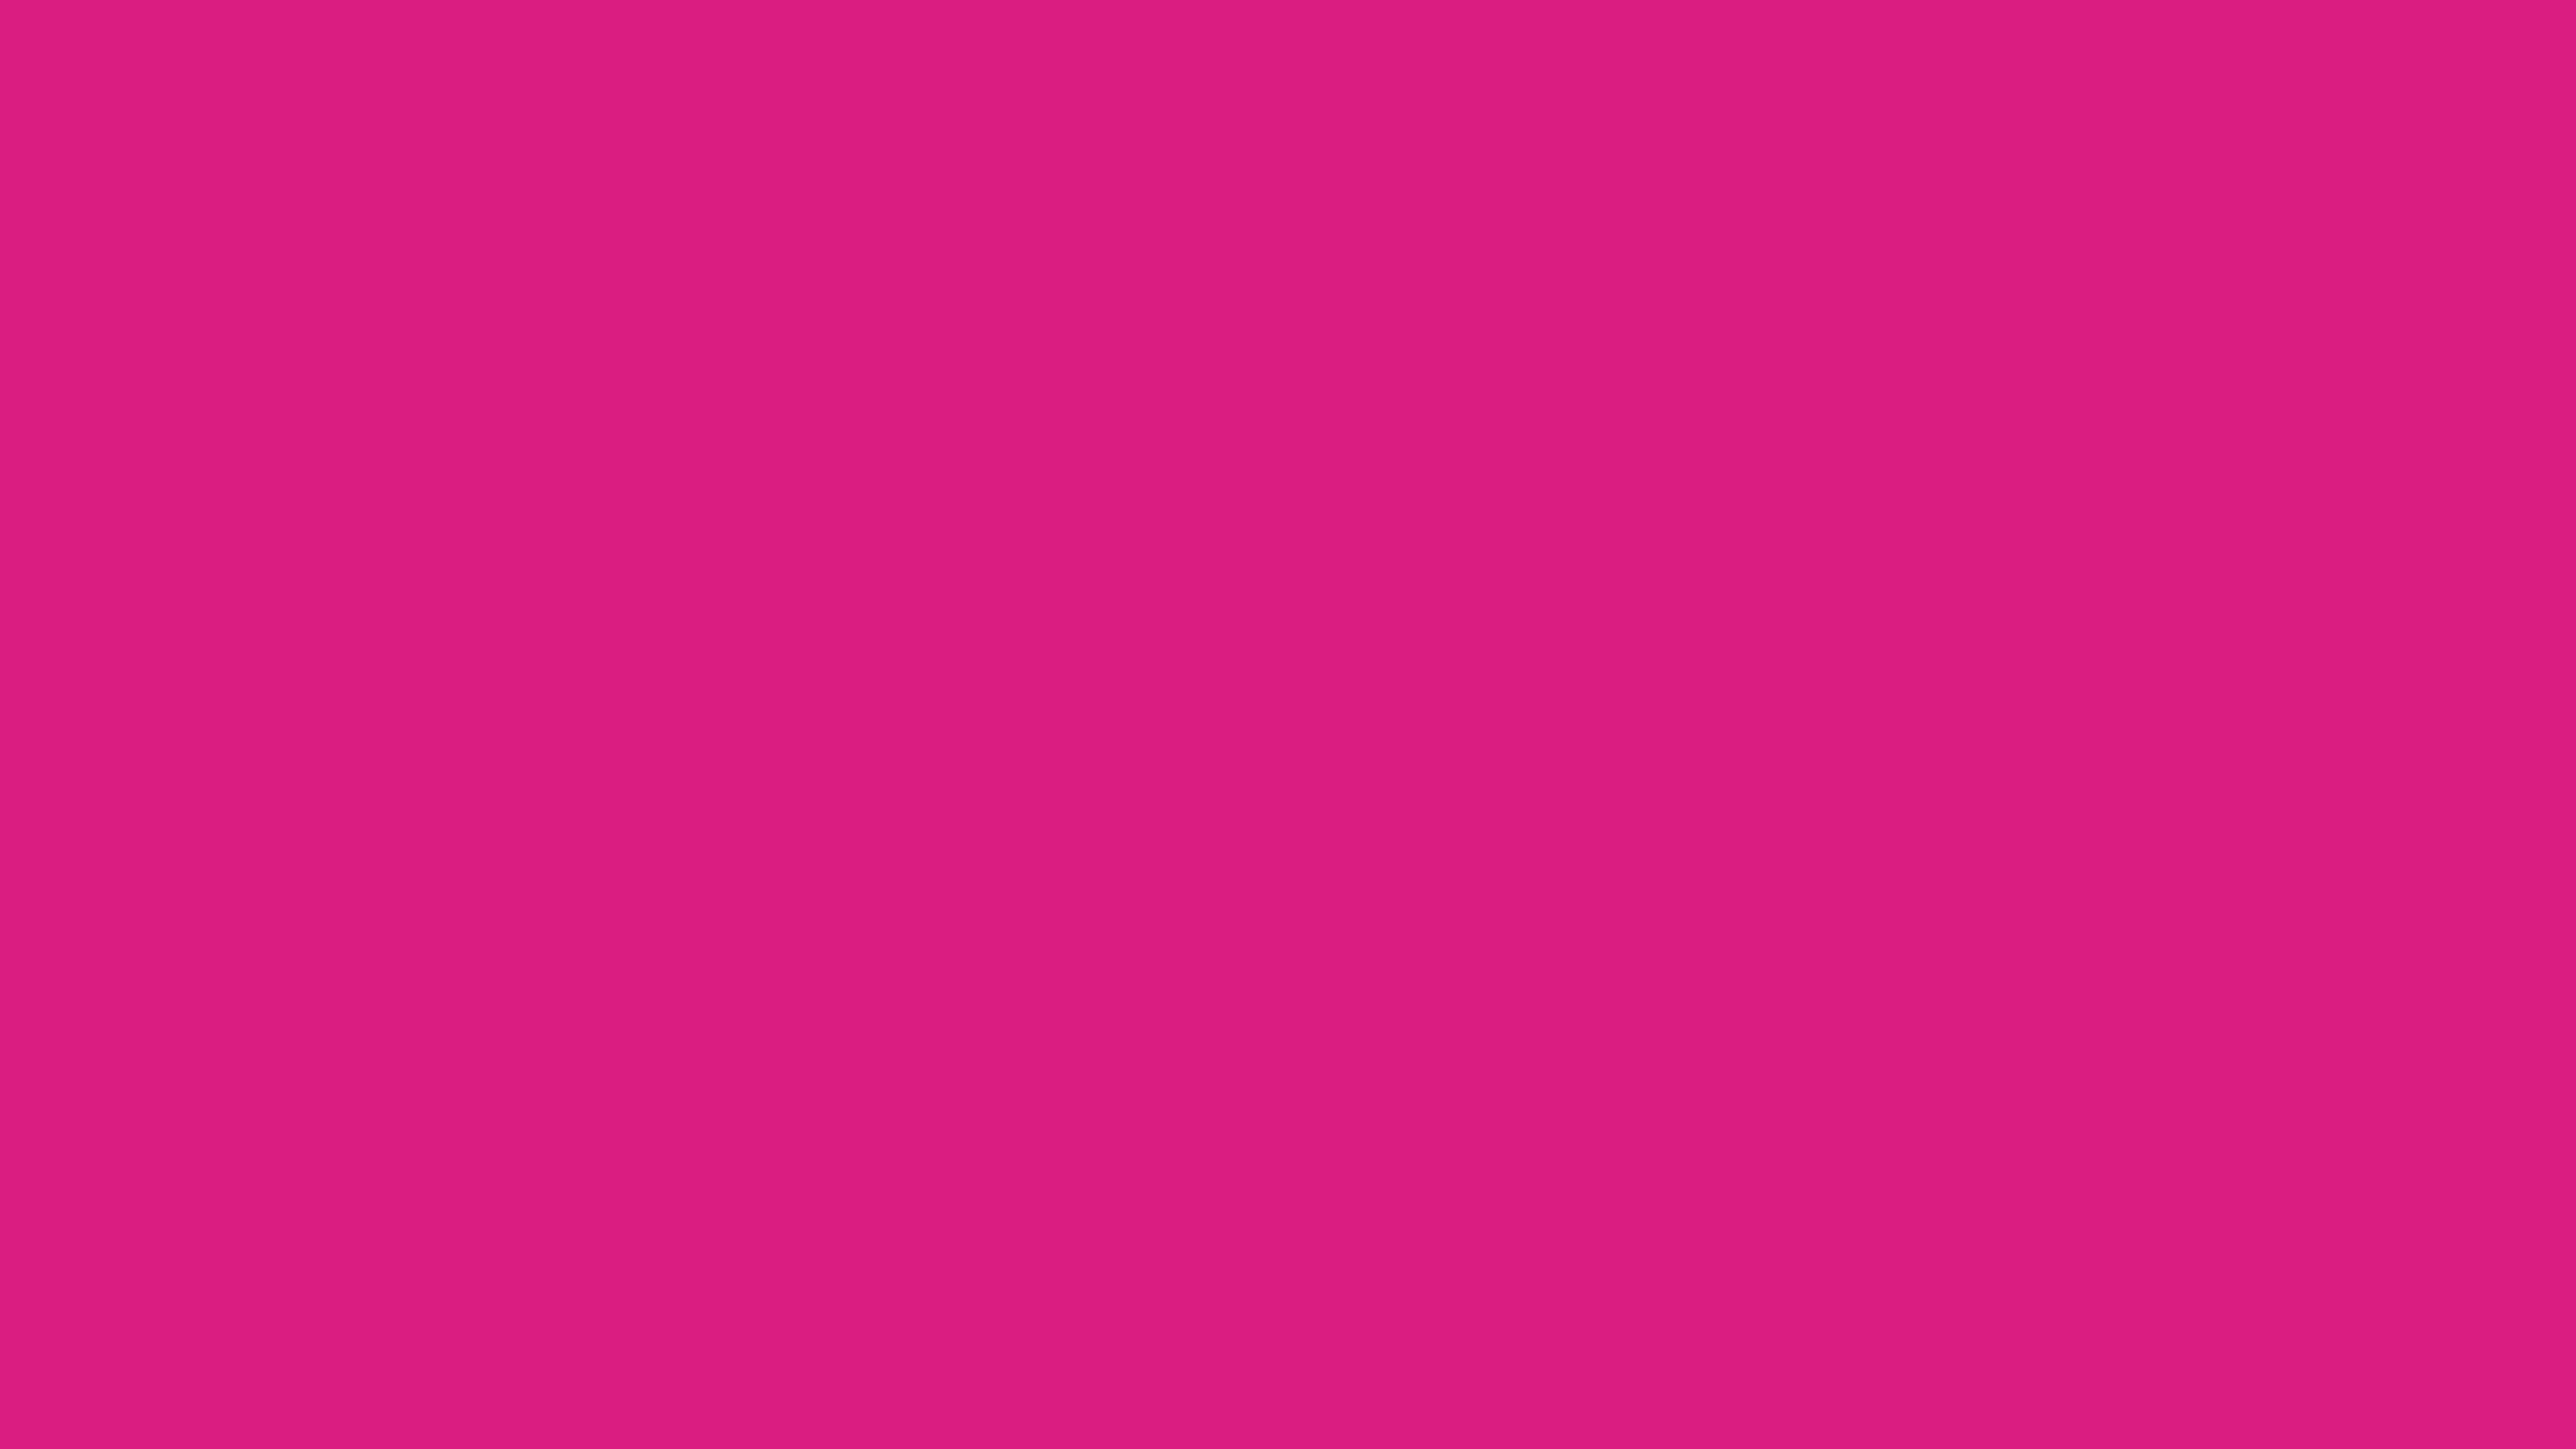 3840x2160 Vivid Cerise Solid Color Background